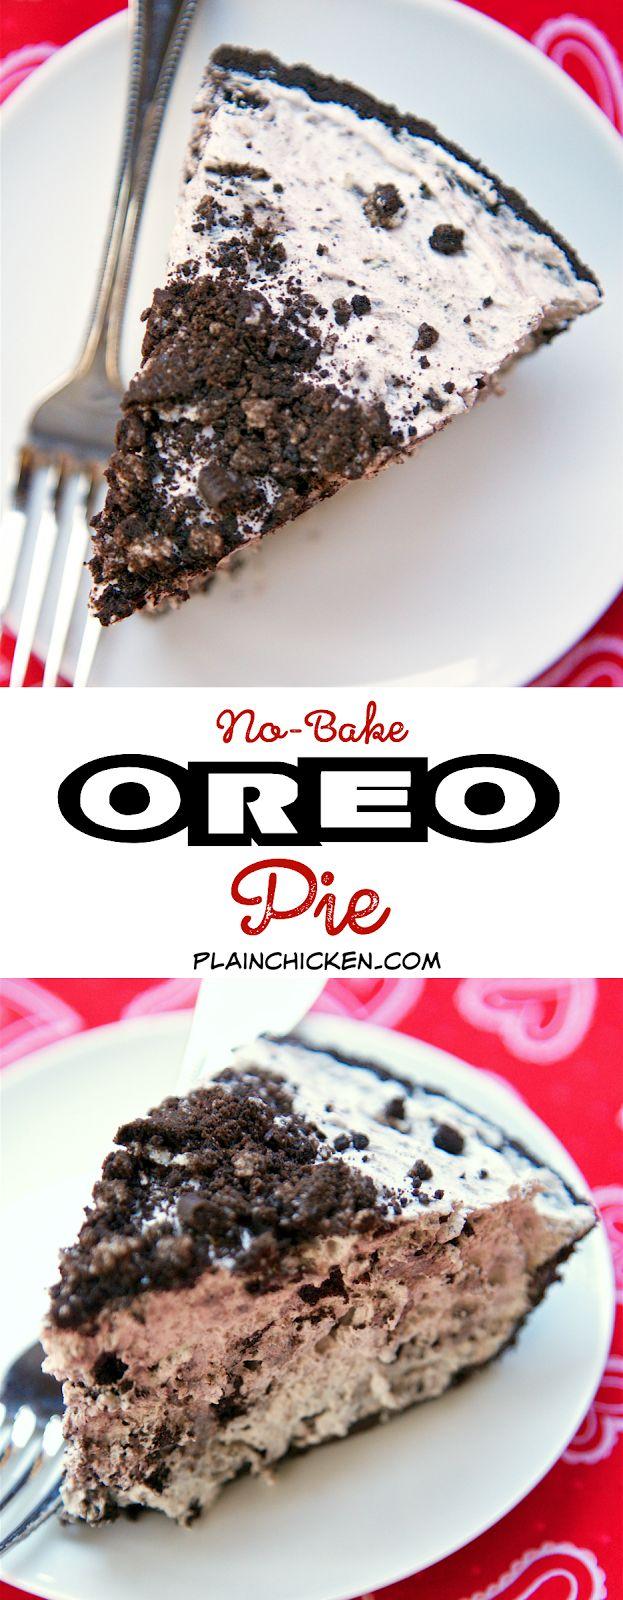 No-Bake Oreo Pie - only 4 ingredients. Takes 5 minutes to make and tastes amazing!! Oreo lover's dream!